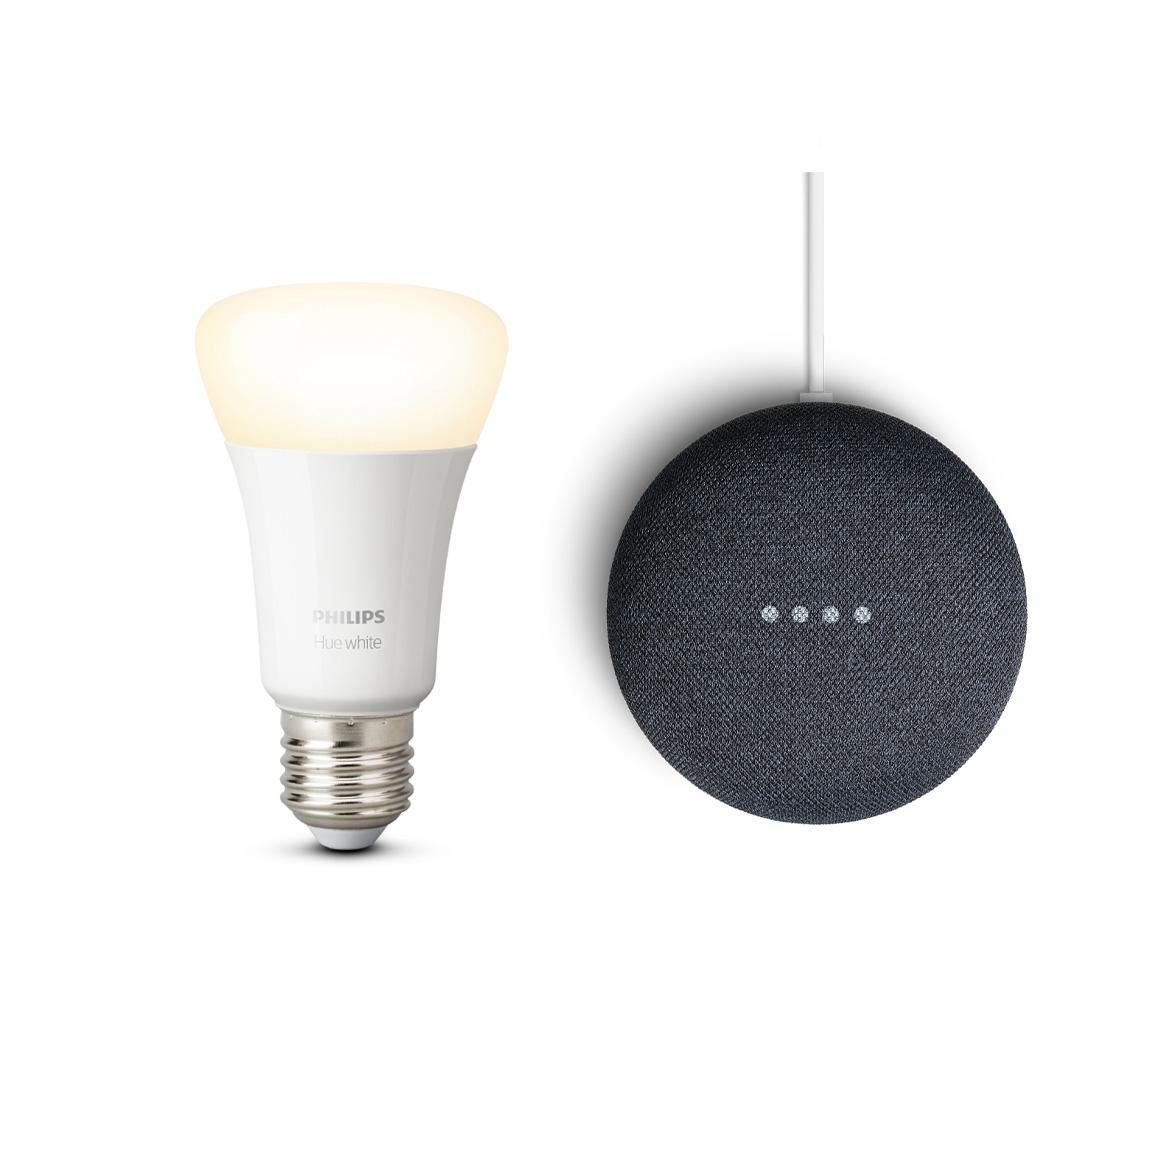 Google Nest Mini + gratis Philips Hue White E27 Bluetooth